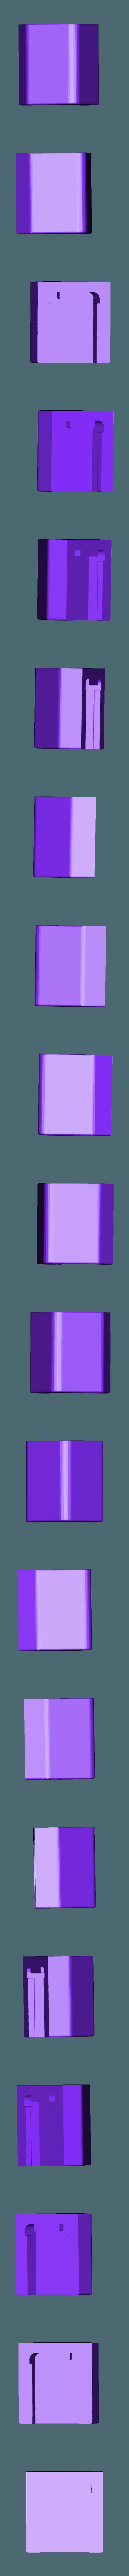 Mini_corner_clamp_inside_right_angle.stl Download free STL file mini trigger clamp for corners • Design to 3D print, Norm202